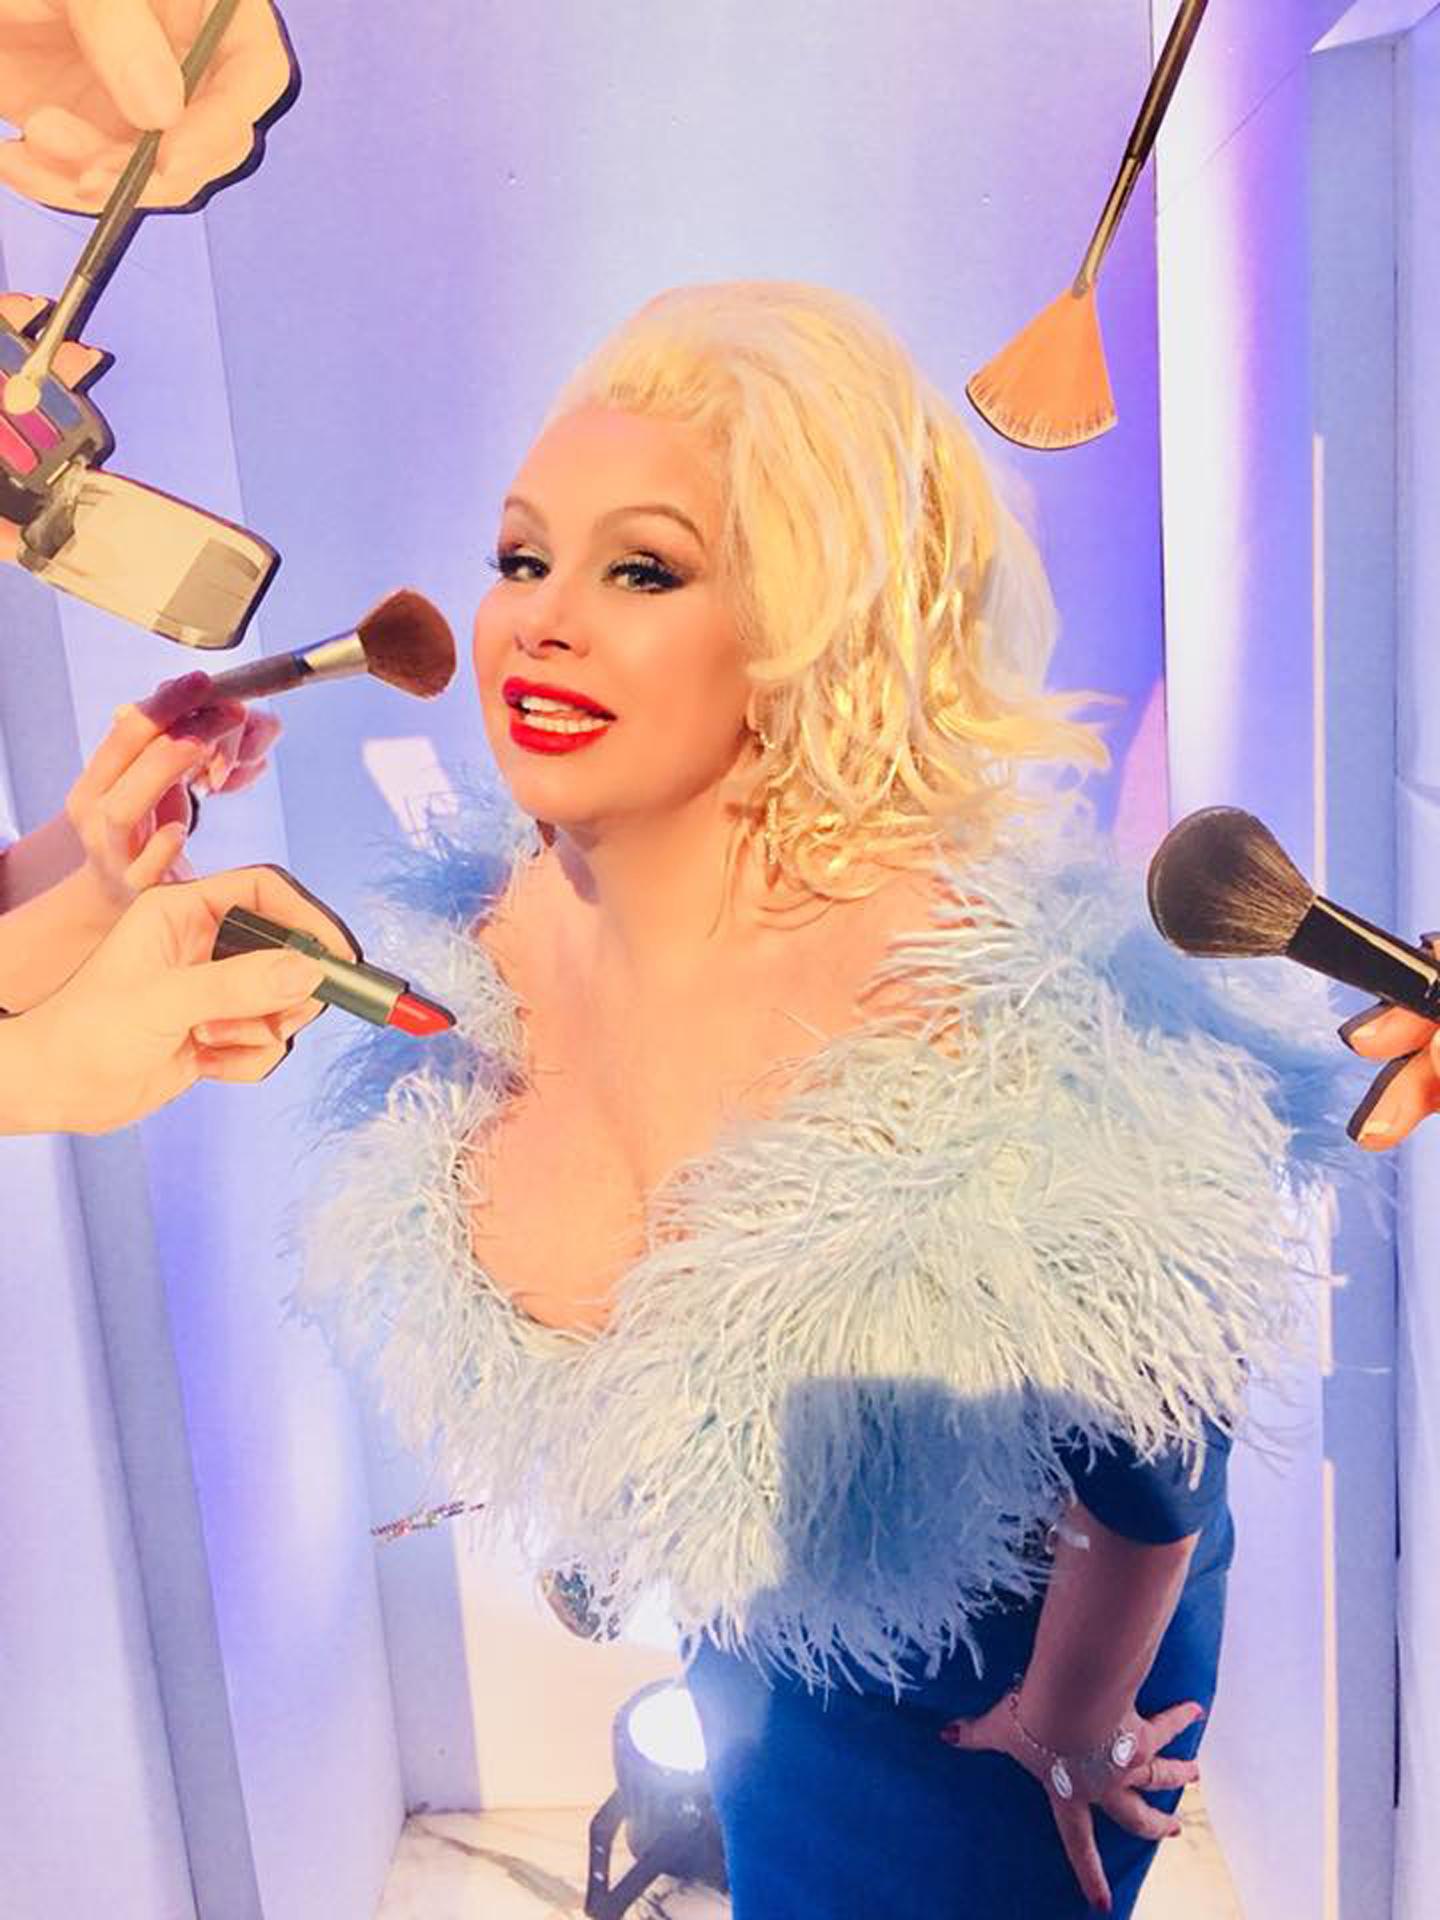 Dianne Brill in Alcone Selfie Make up Booth.jpg